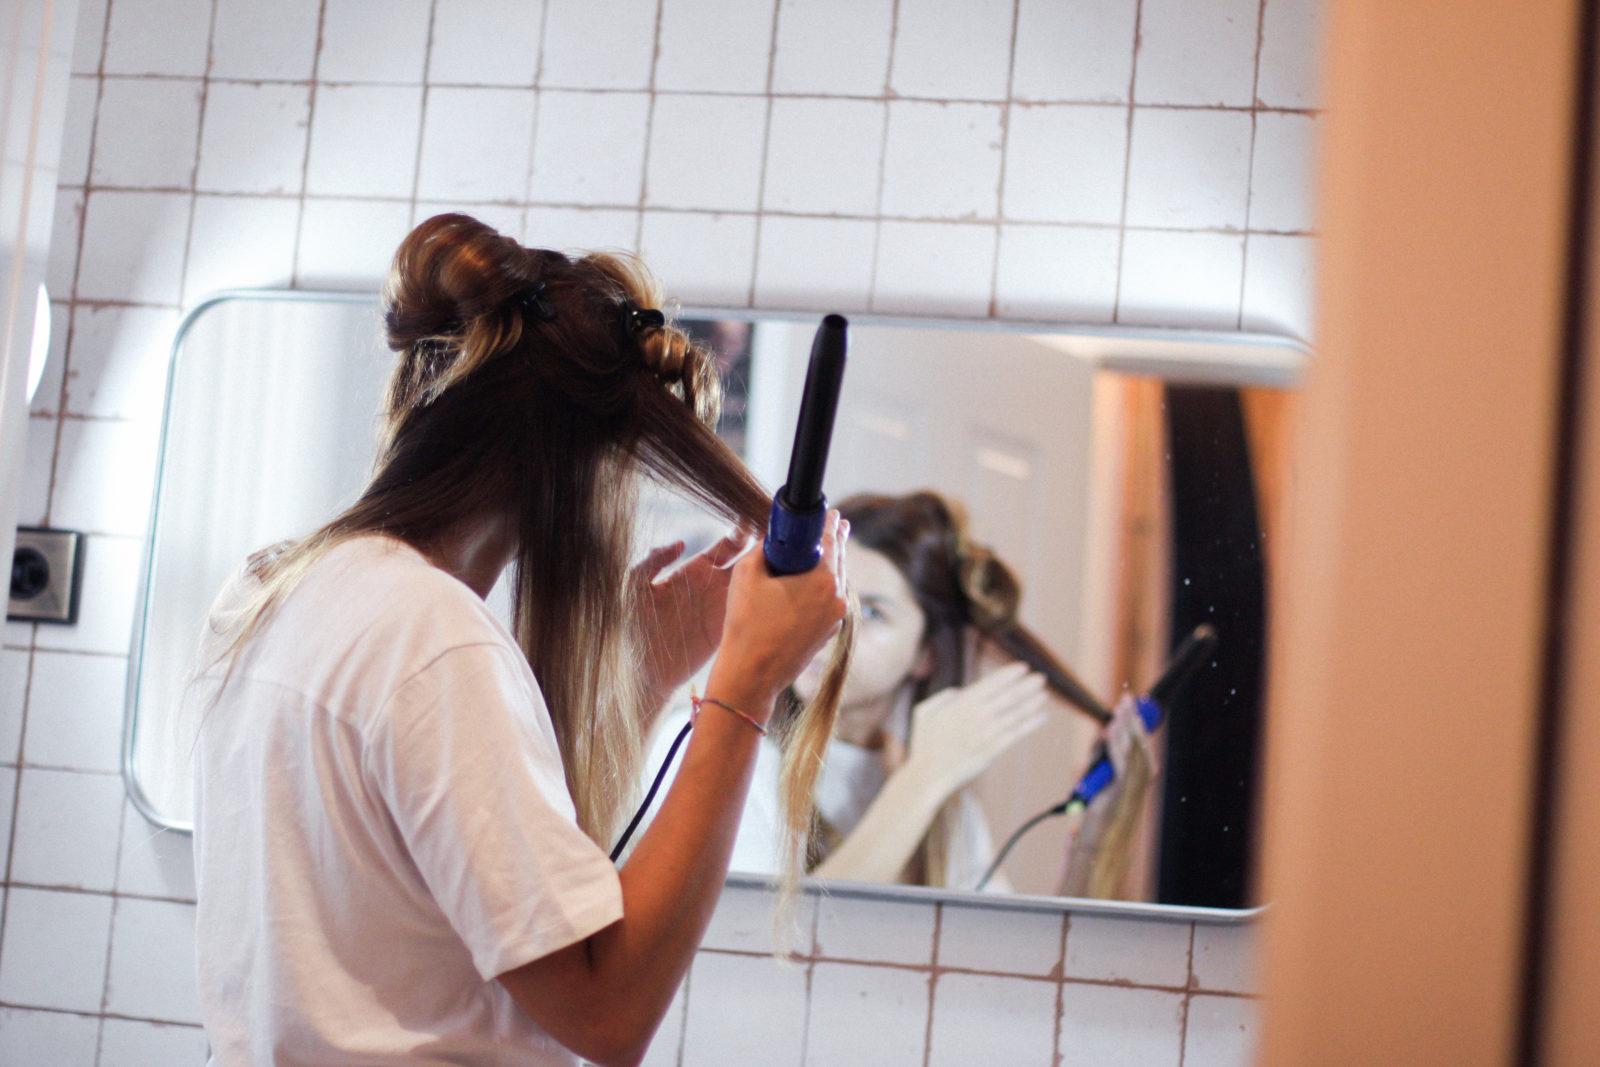 sapphire_curler_irresistibleme_hair_style-23